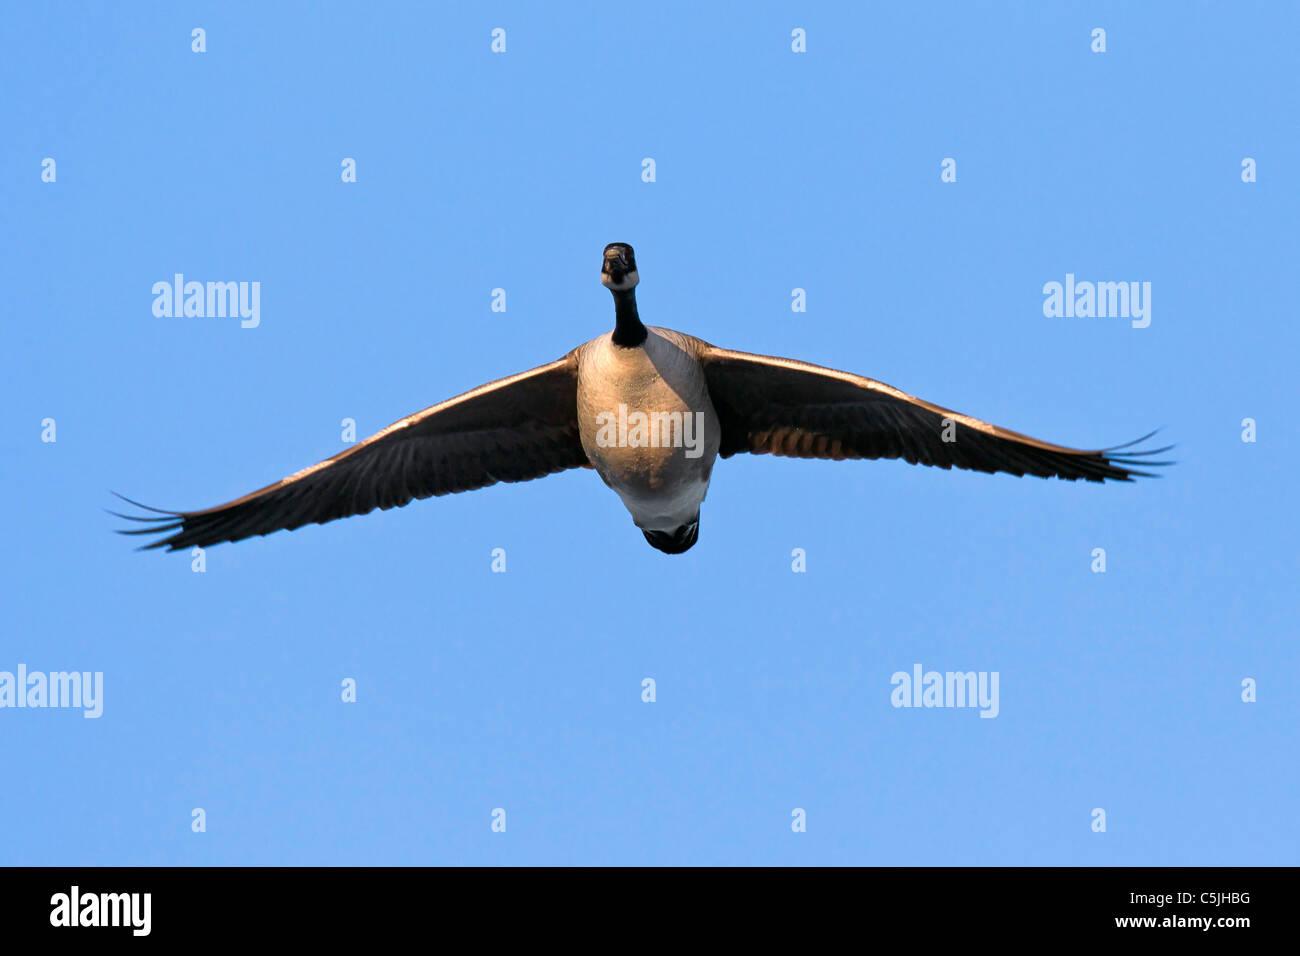 Canada Goose (Branta canadensis) in flight, Dalarna, Sweden - Stock Image